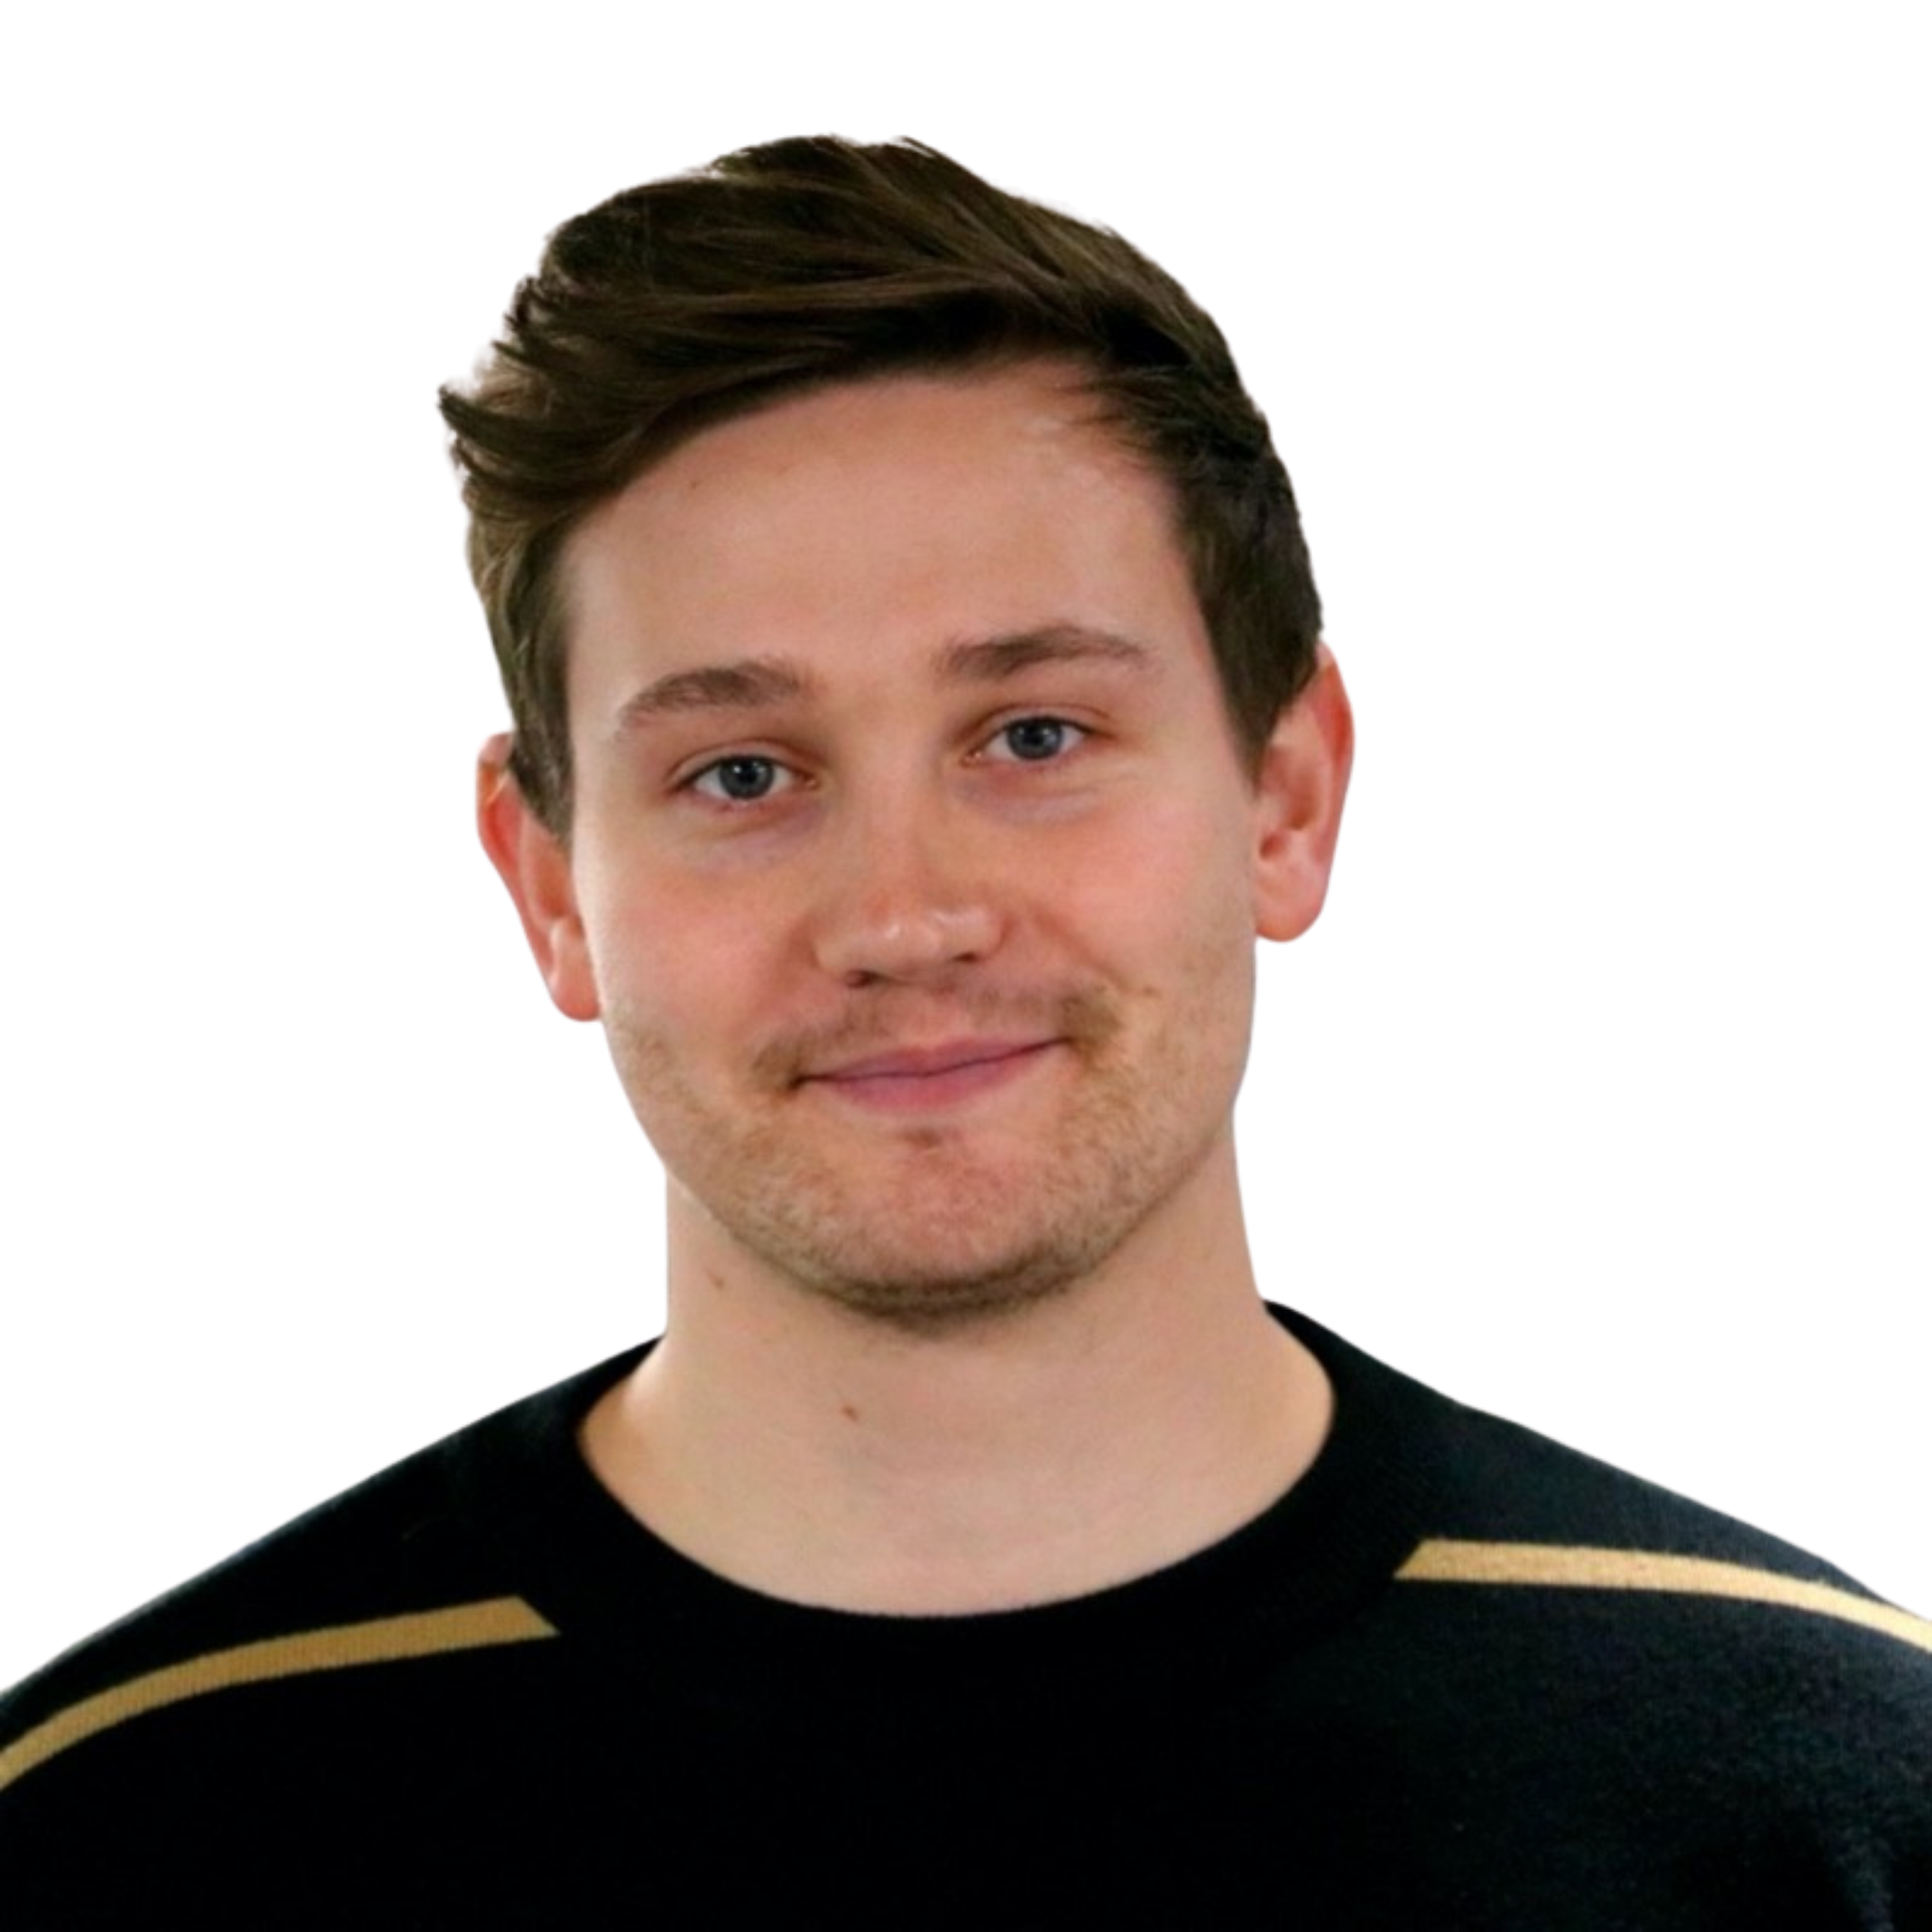 Joe Lawson - Meet the Team